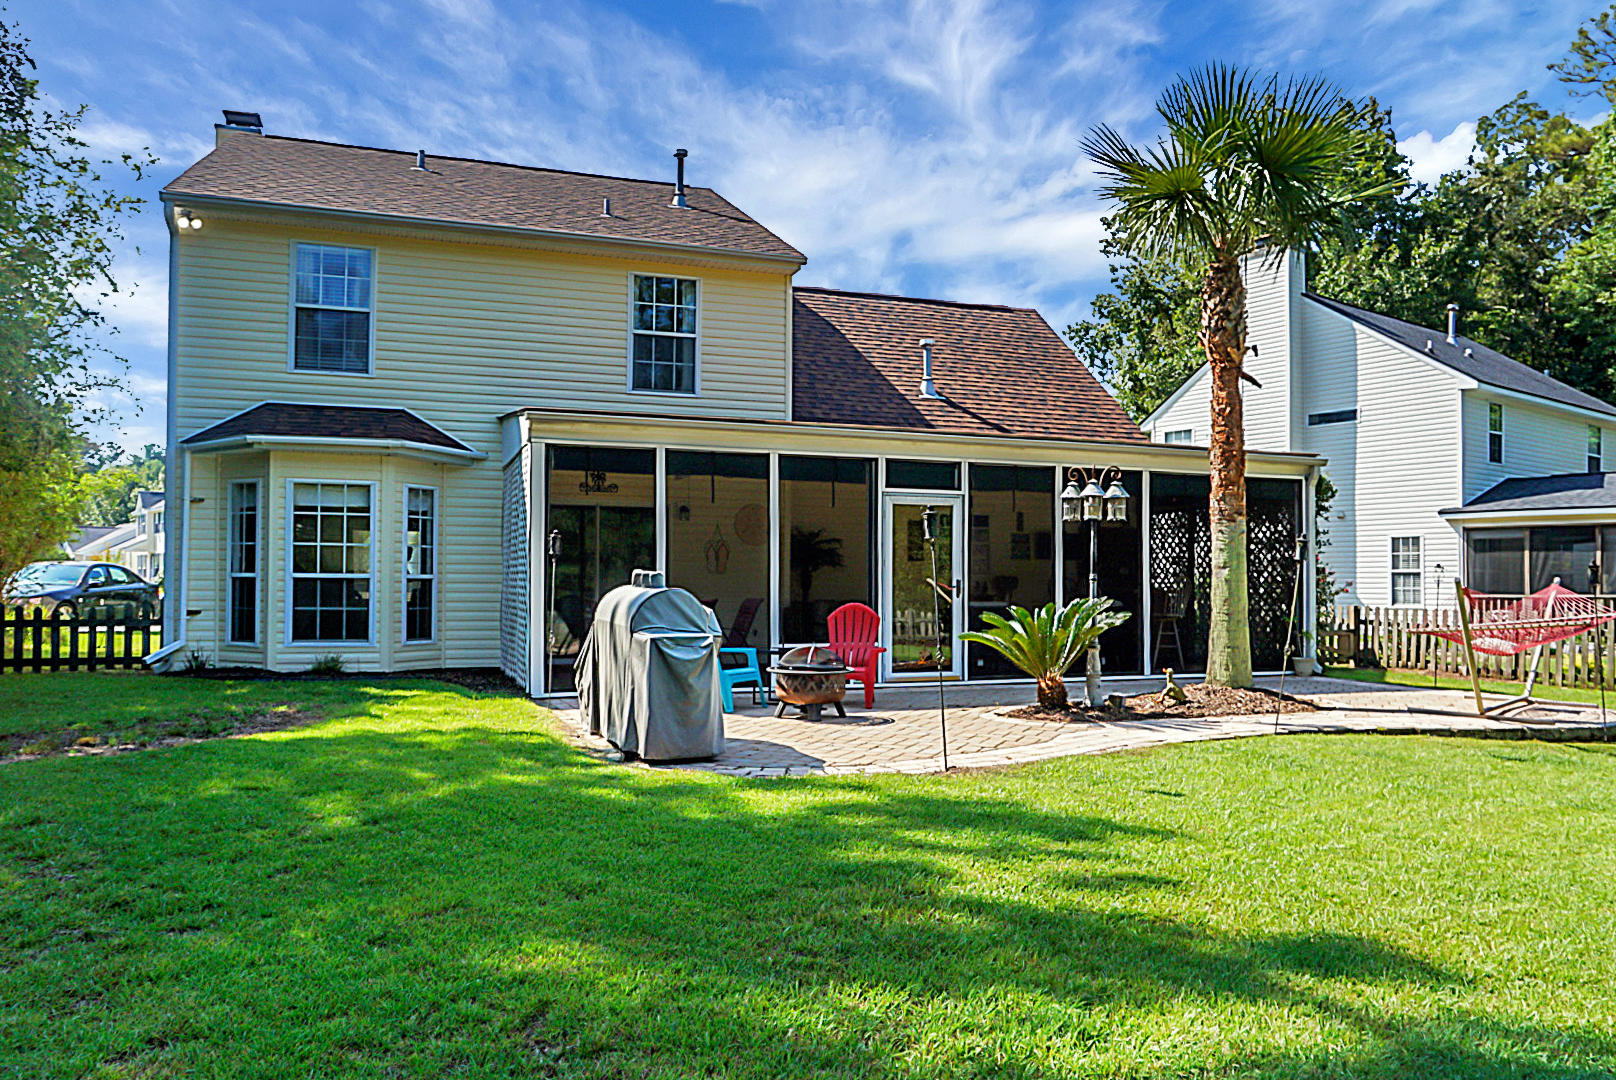 Ivy Hall Homes For Sale - 3075 Morningdale, Mount Pleasant, SC - 7